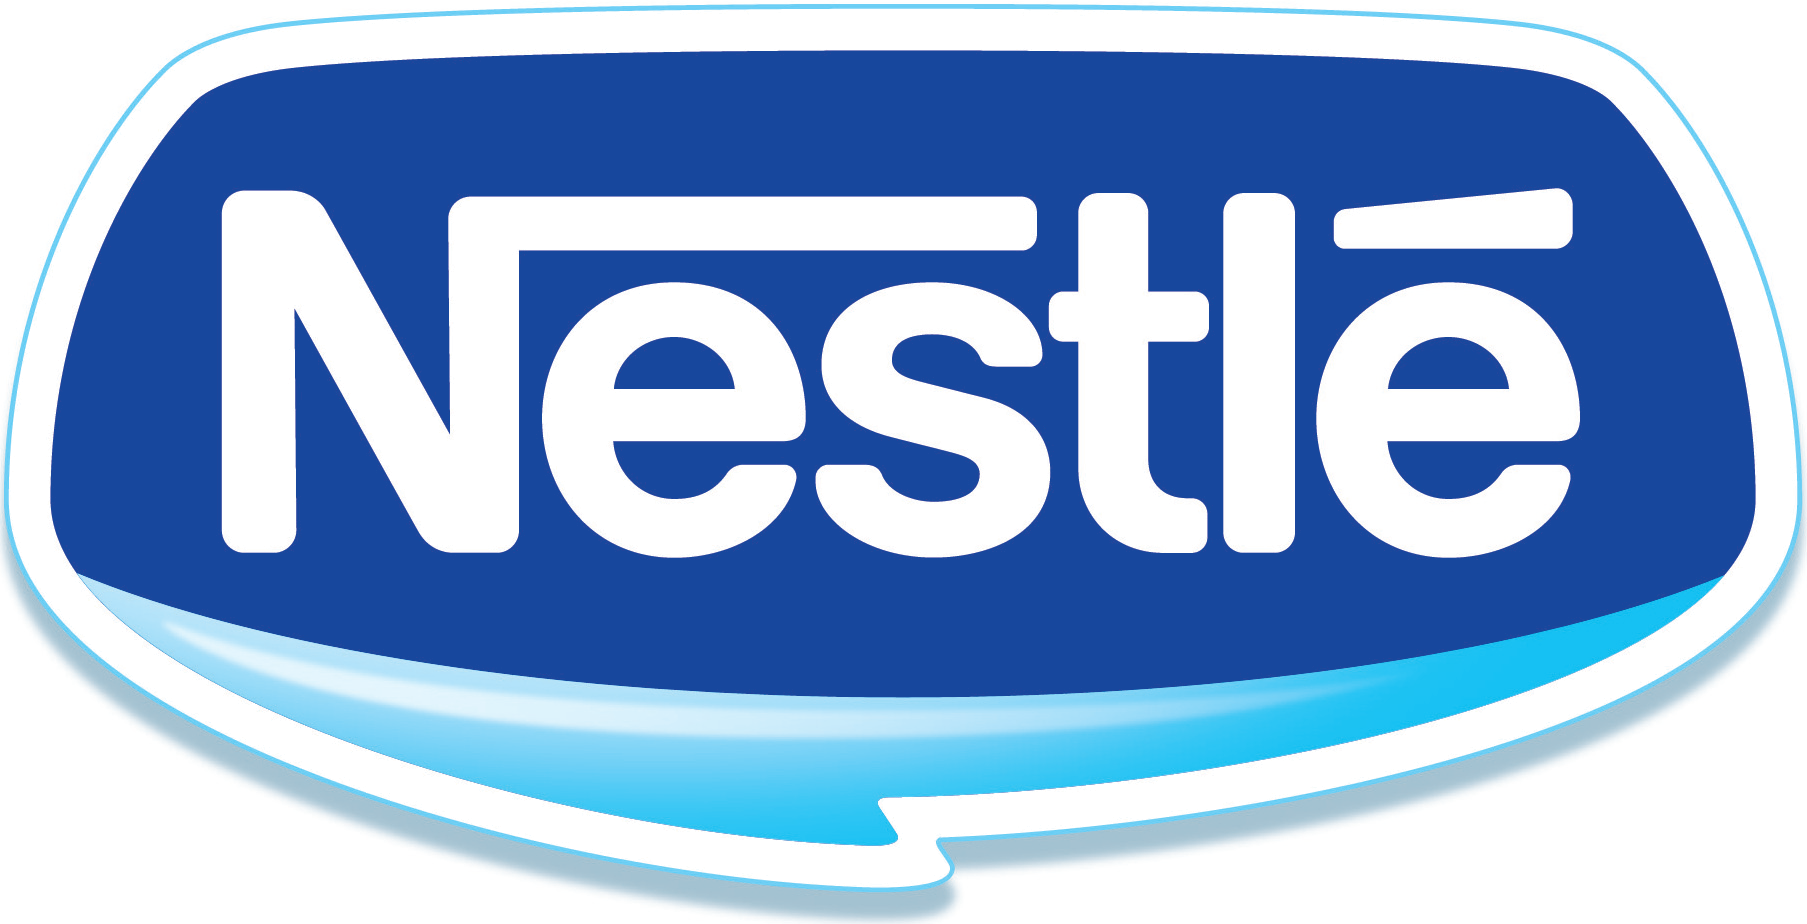 logo nestle png transparent logo nestle png images pluspng